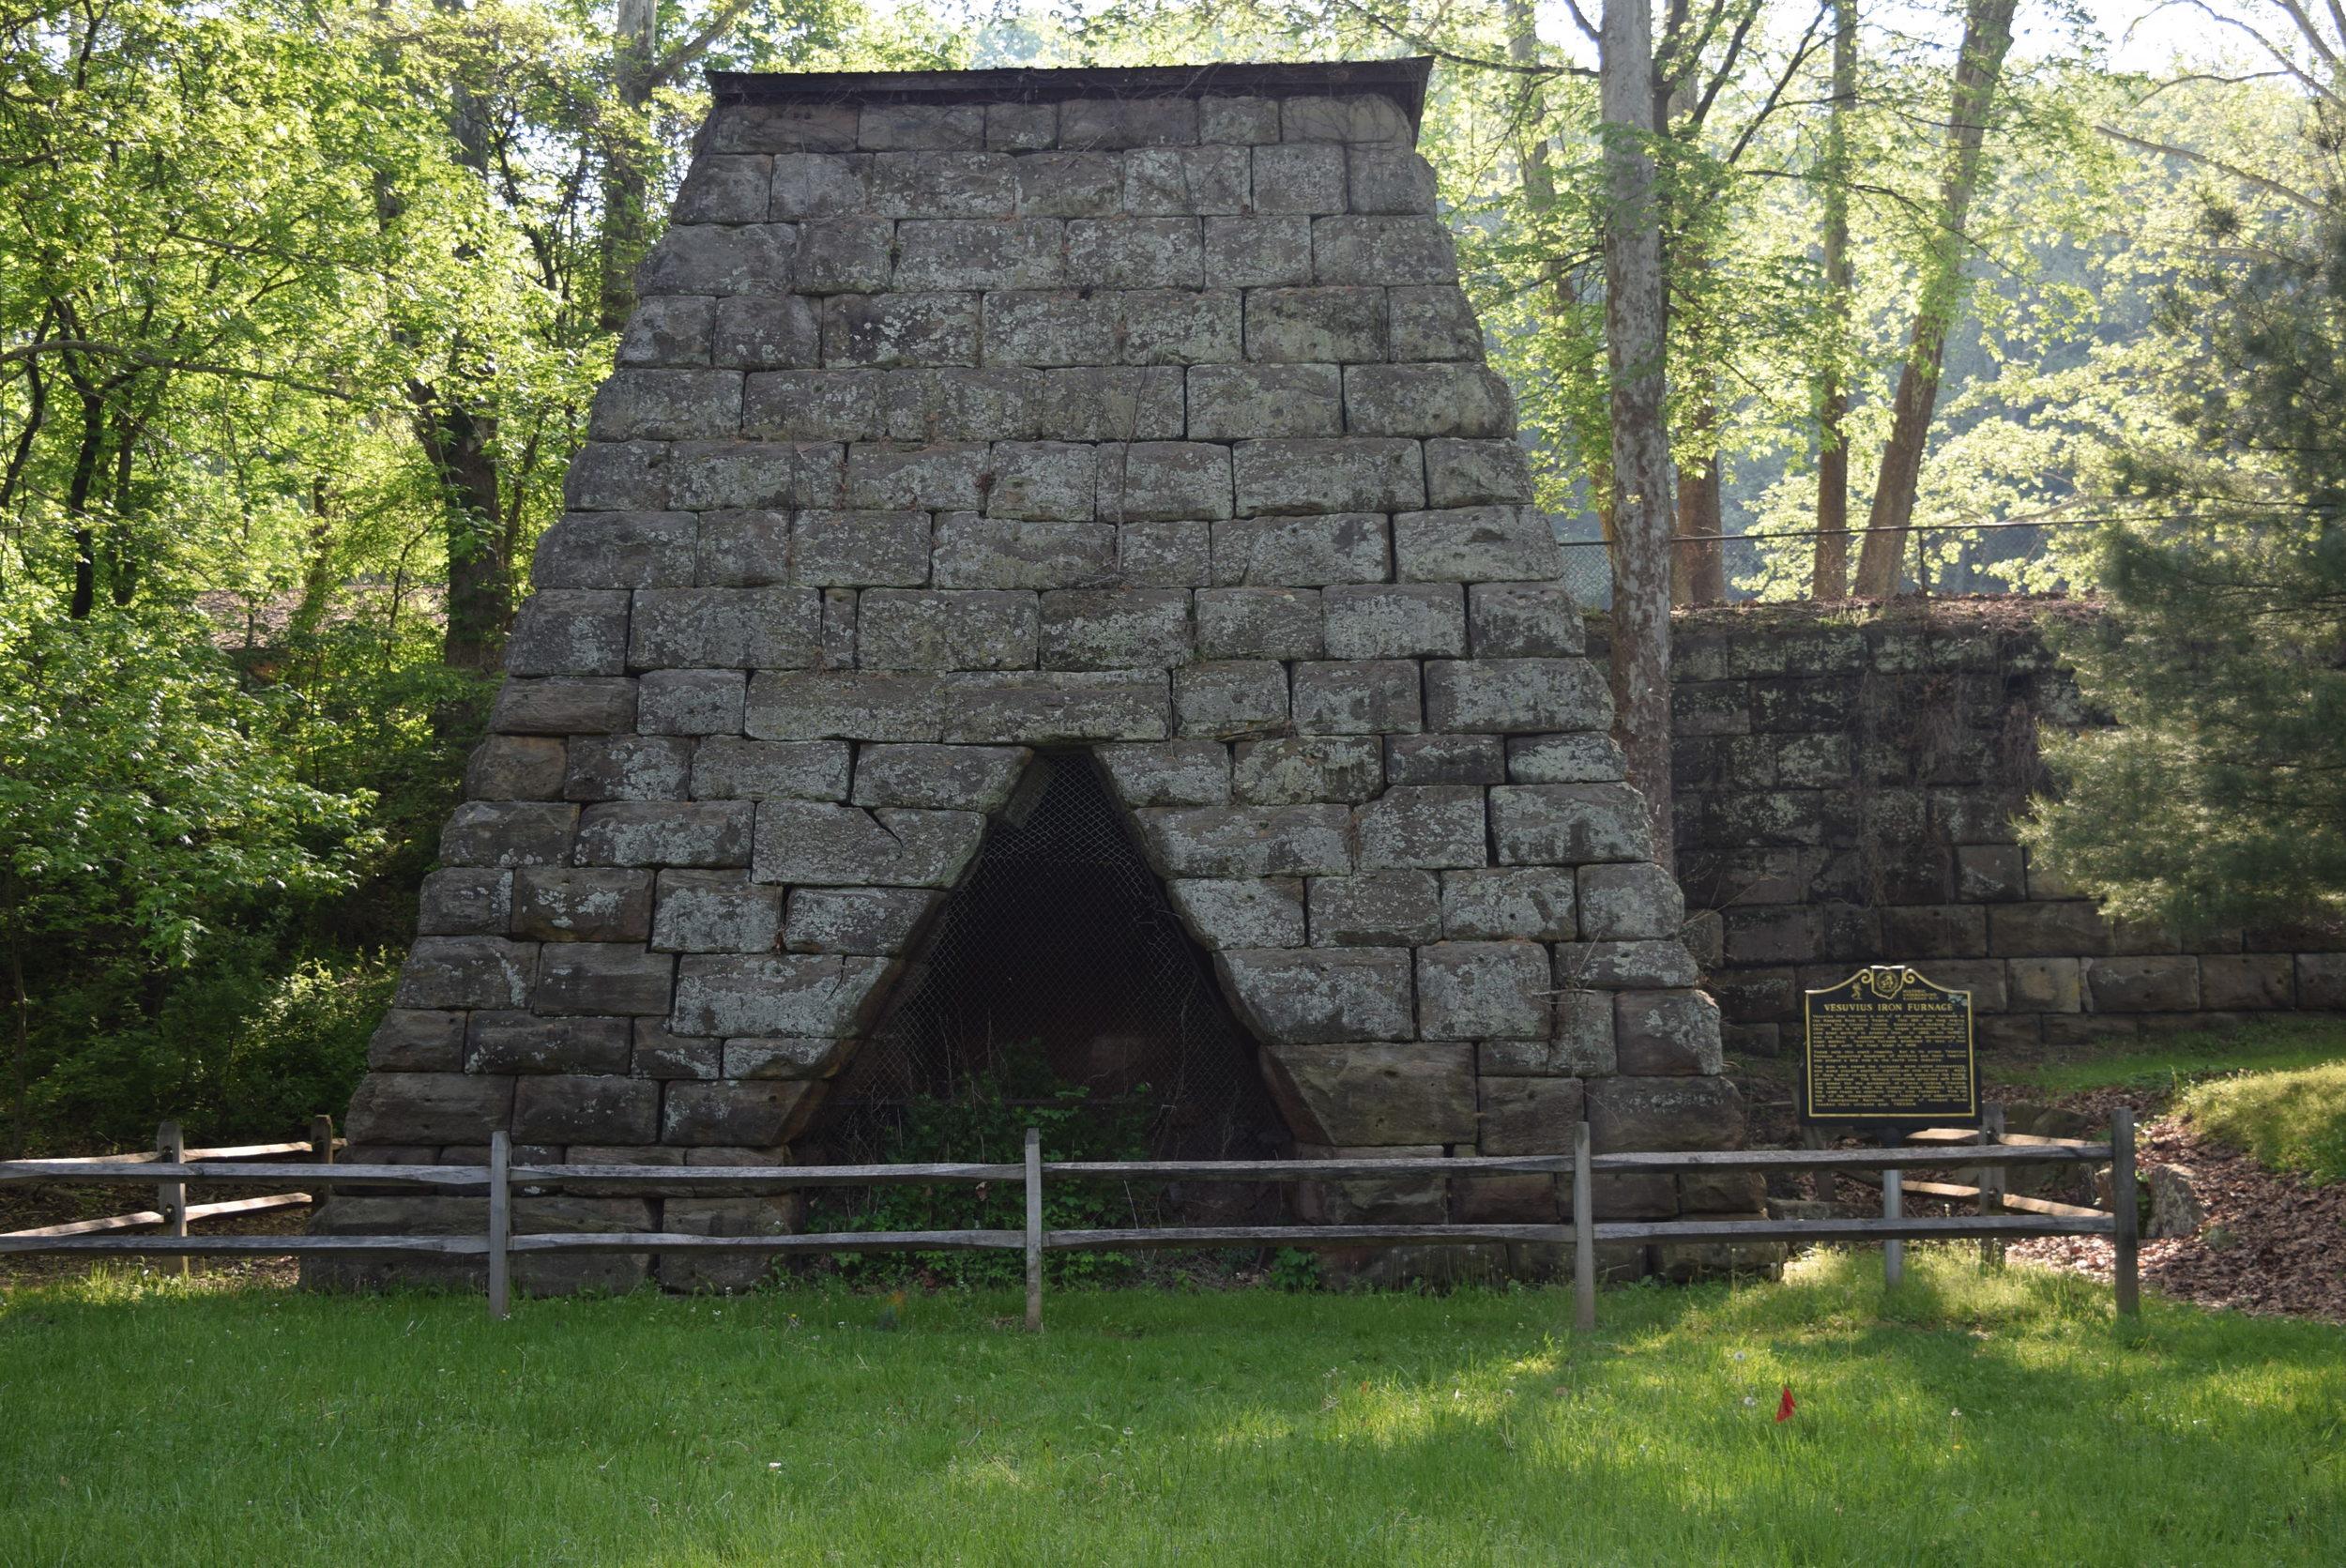 The Vesuvius iron furnace